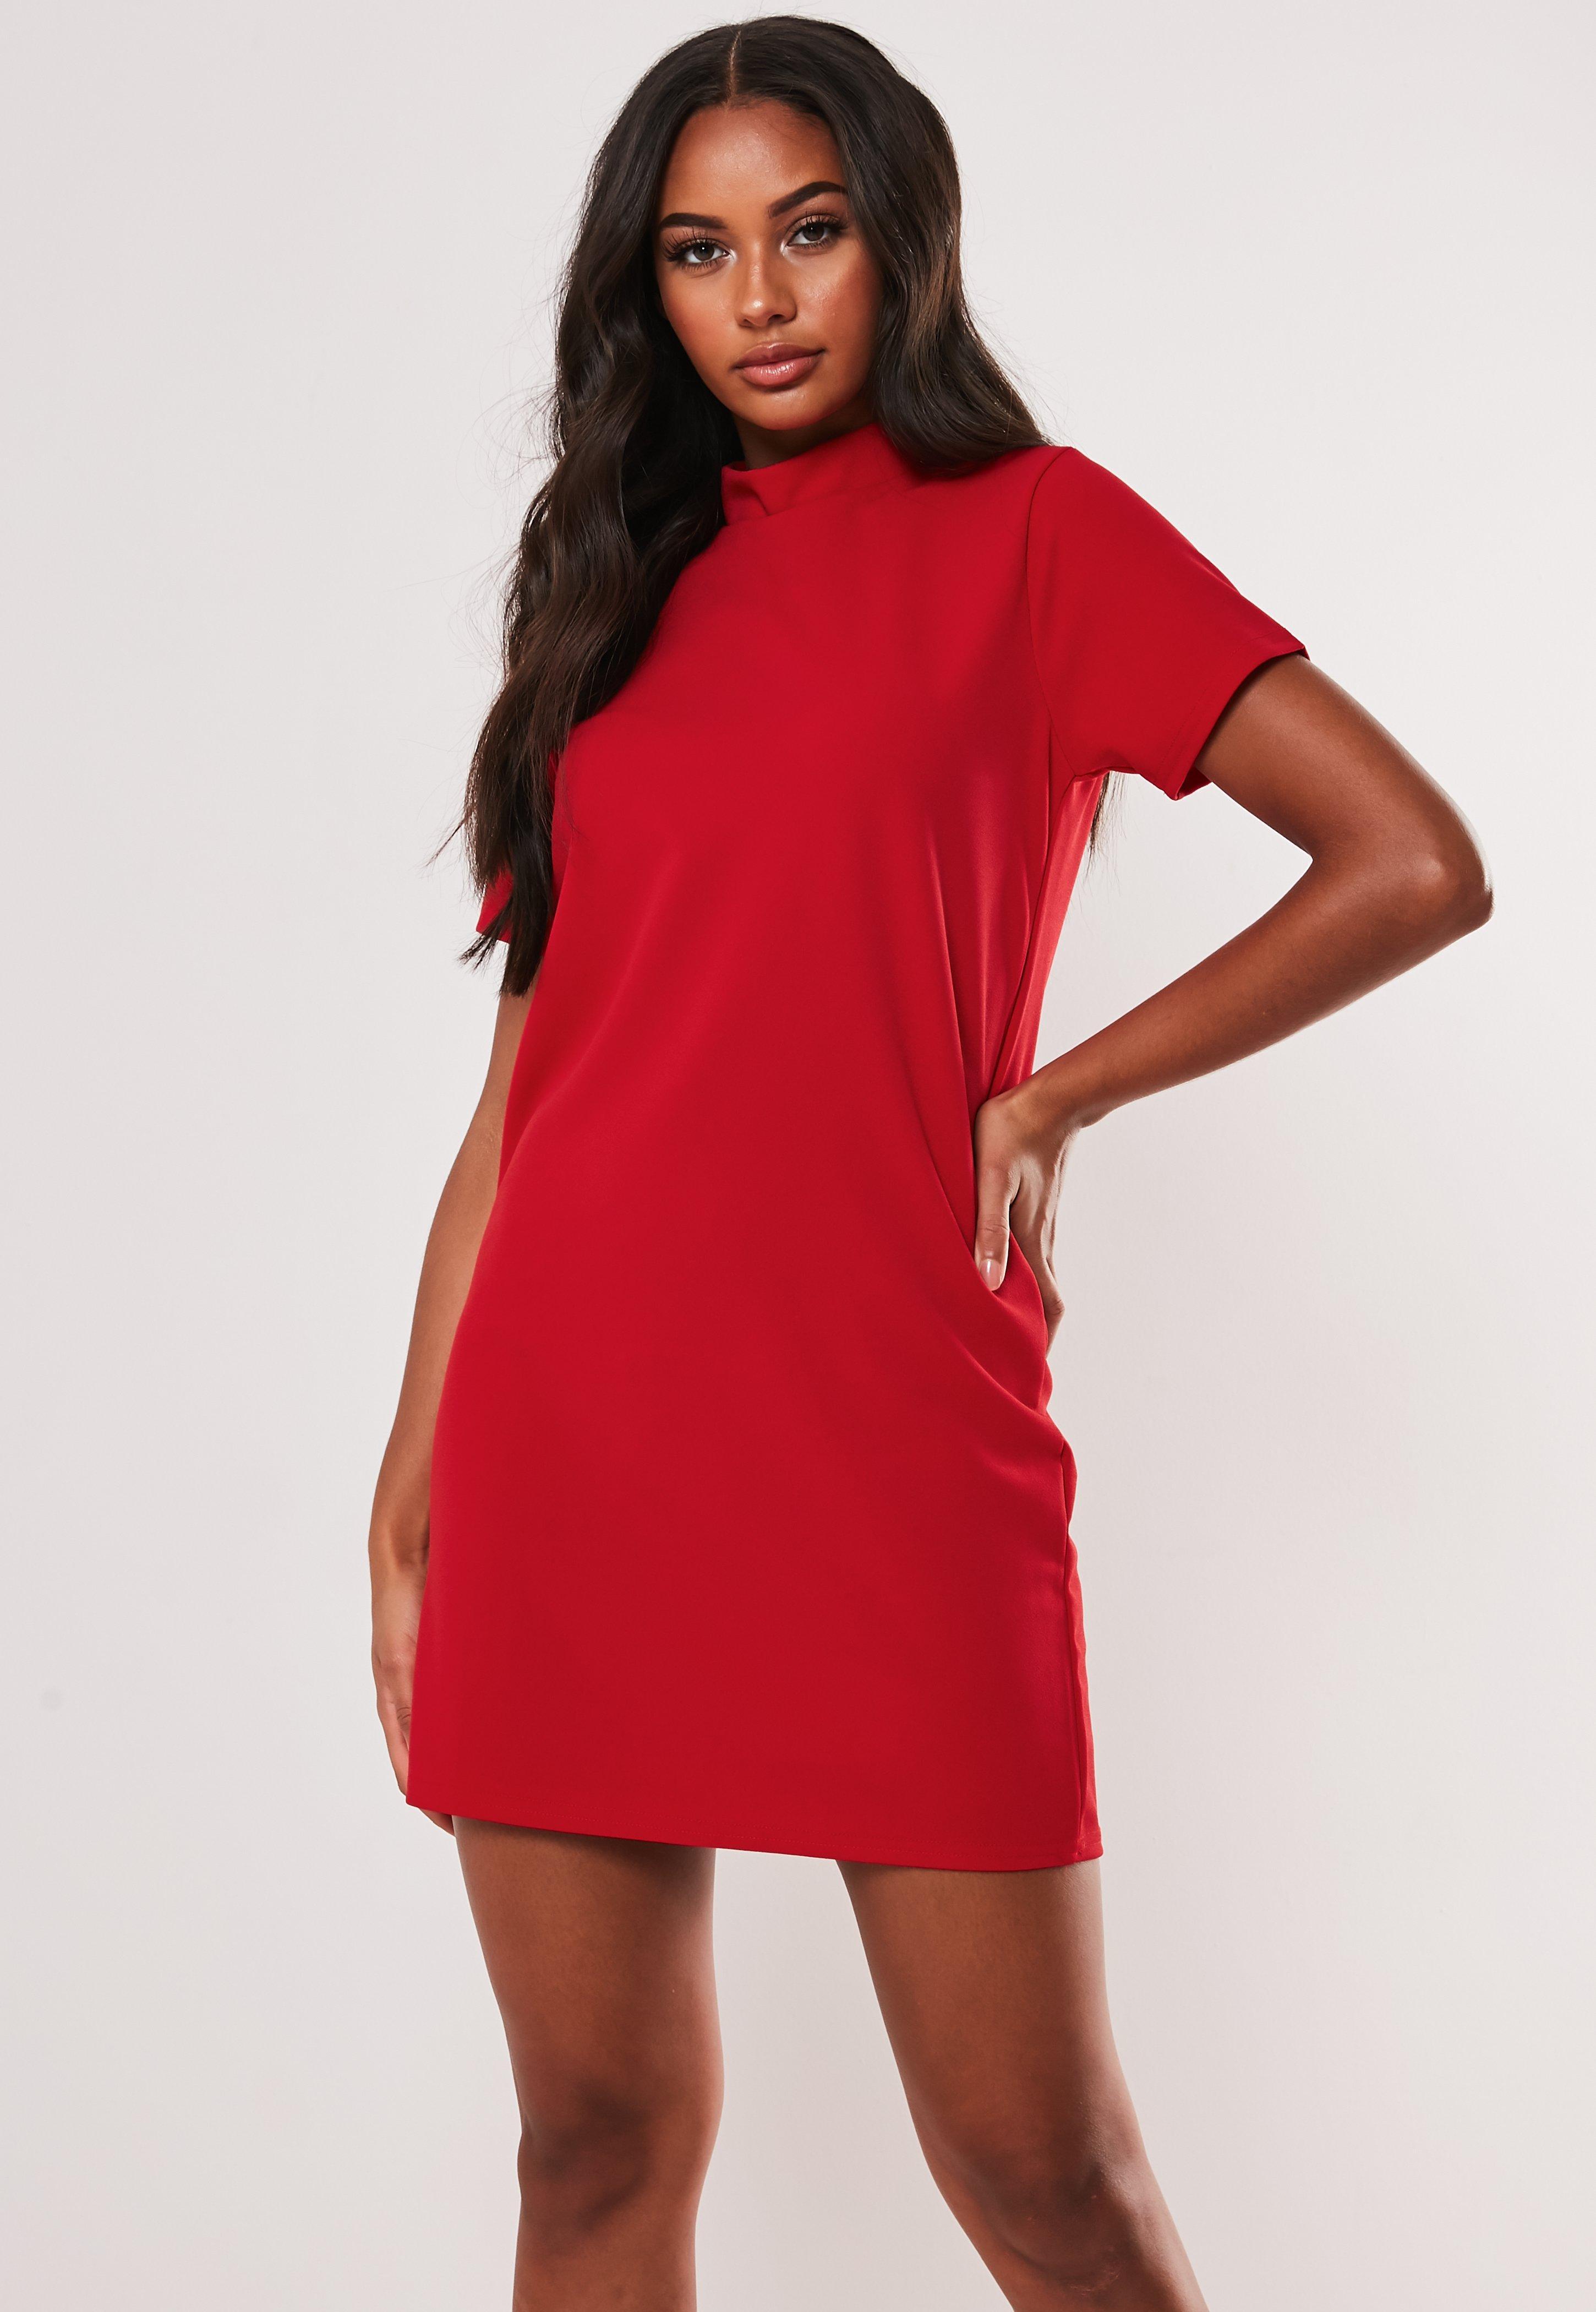 867ef64bb98f8 Red High Neck Shift Dress